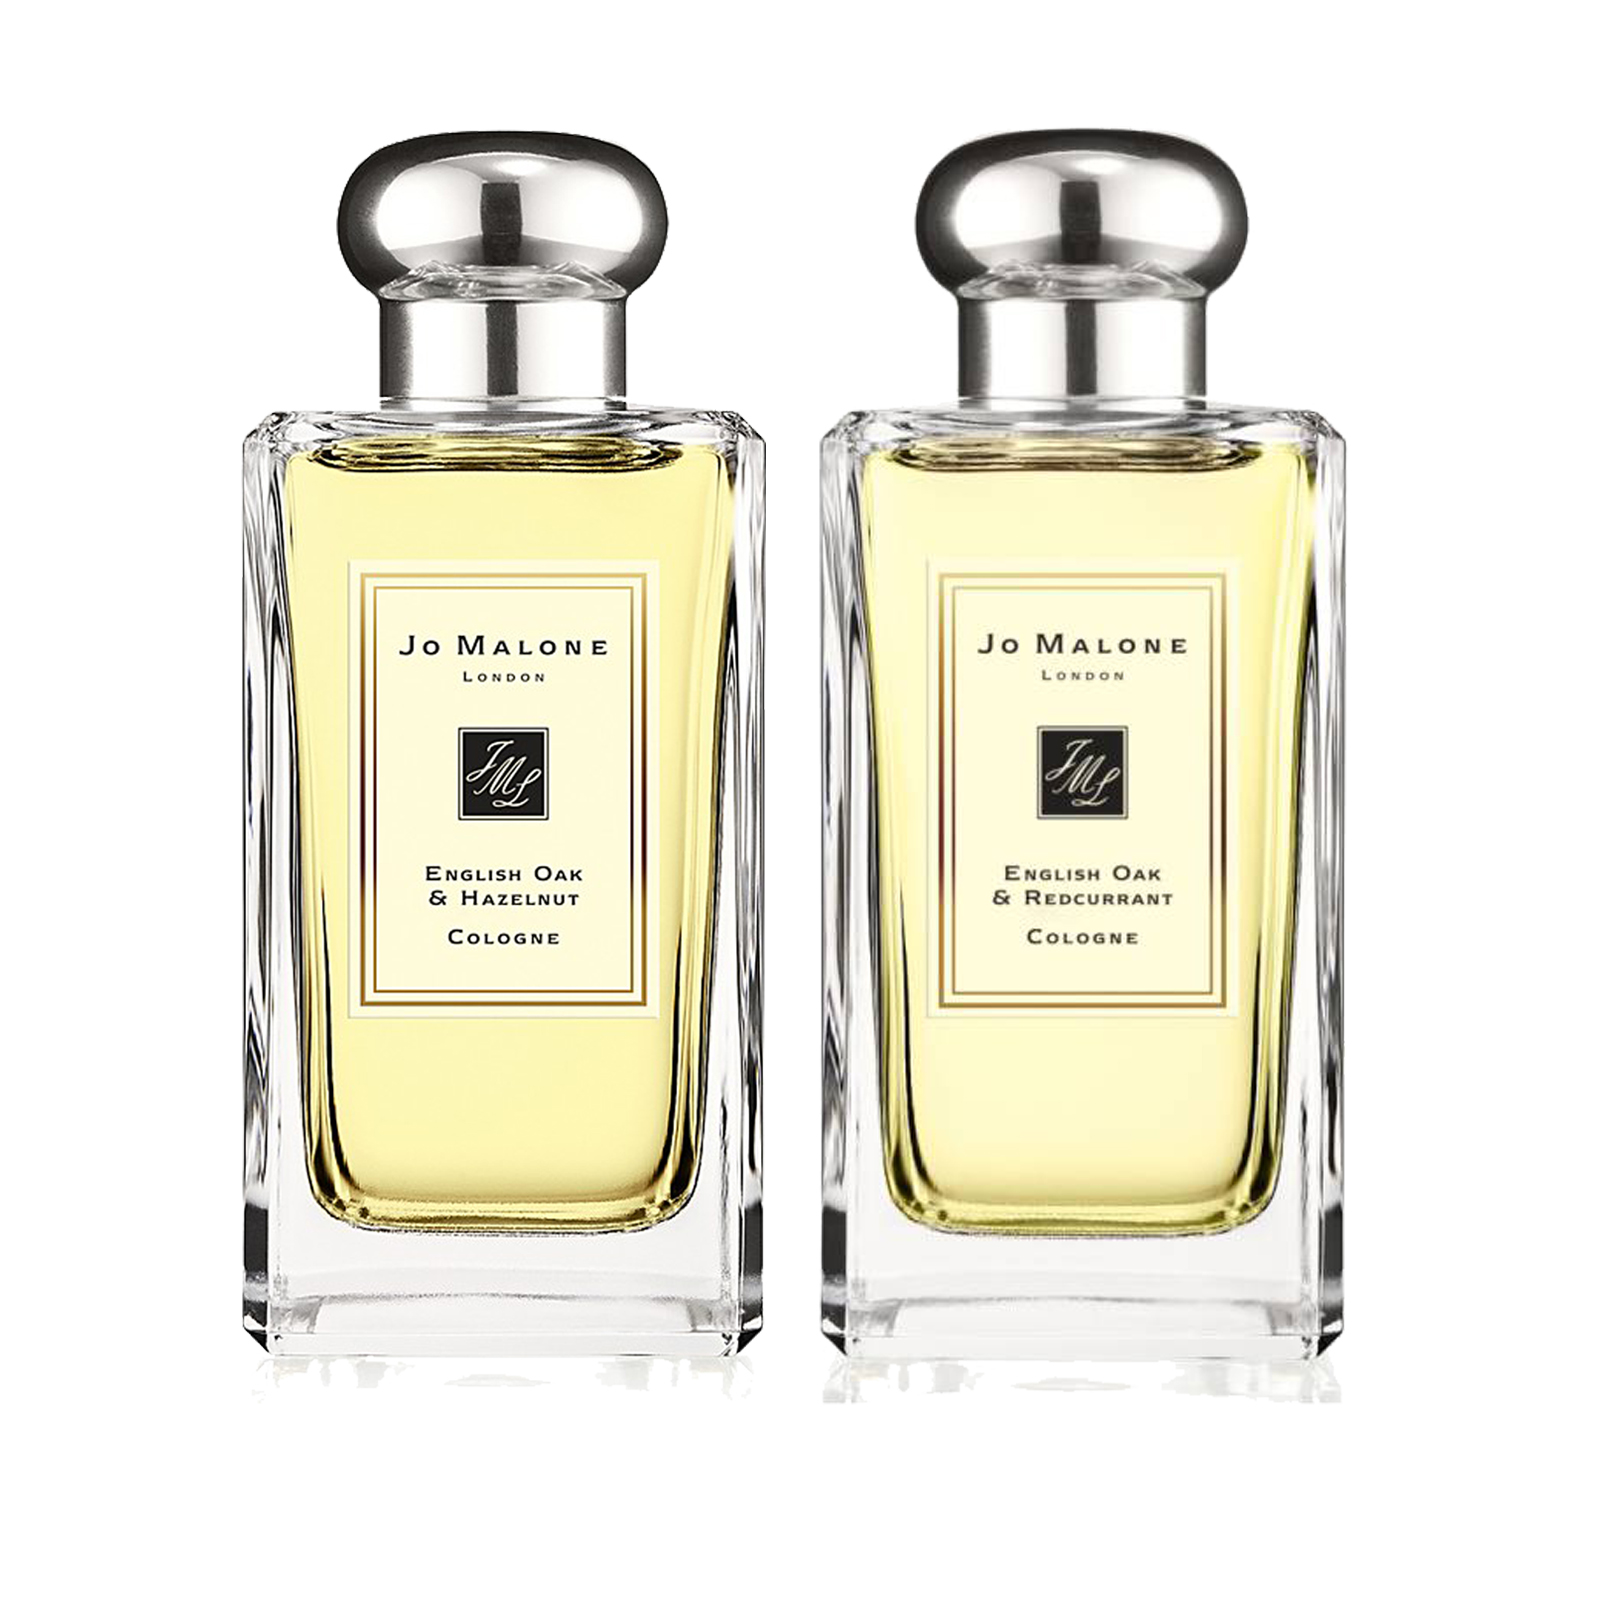 2 perfumes